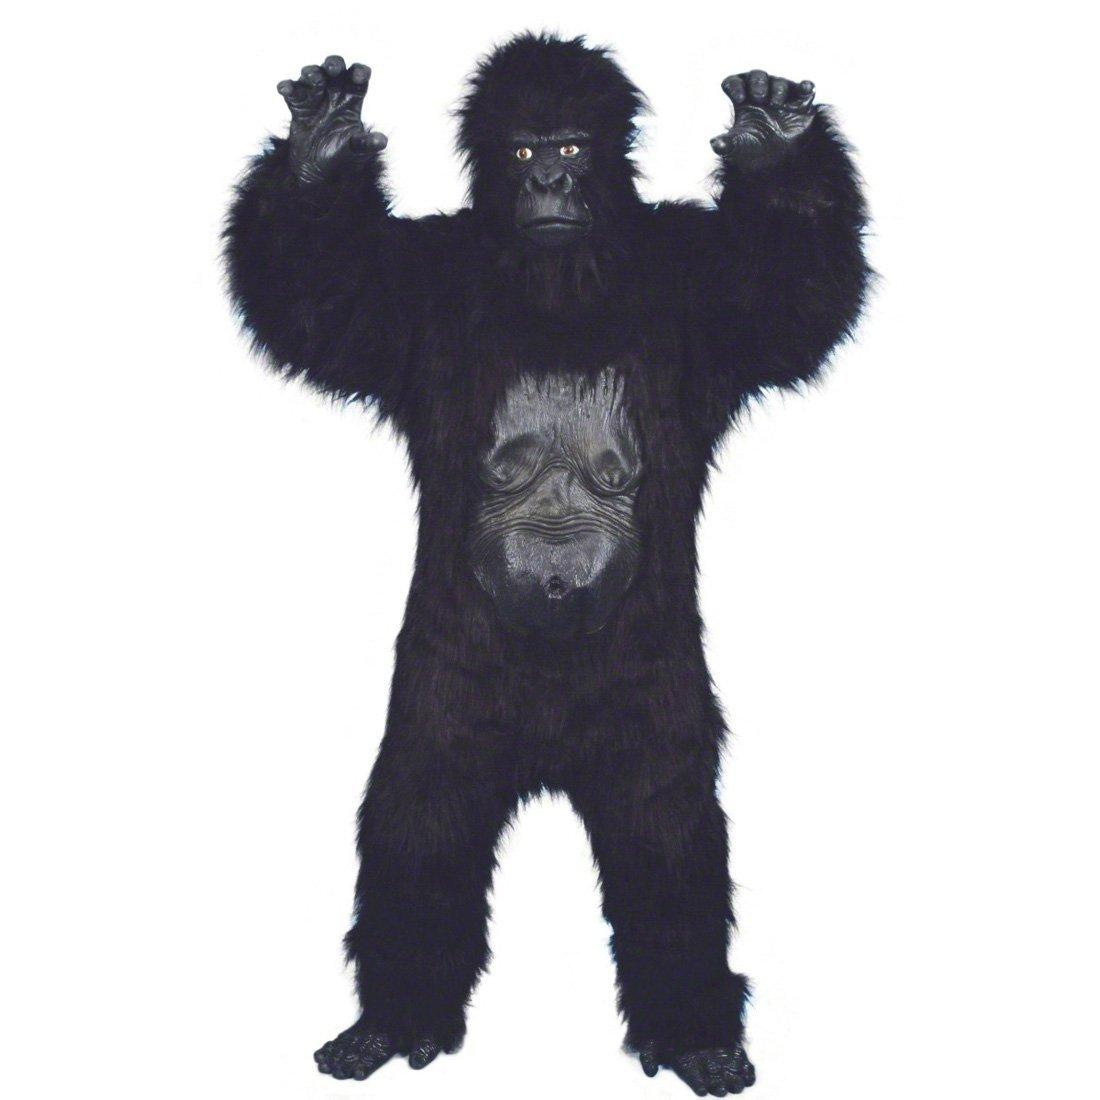 NET TOYS Traje de Mono o Gorila Disfraz King Kong Vestuario ...